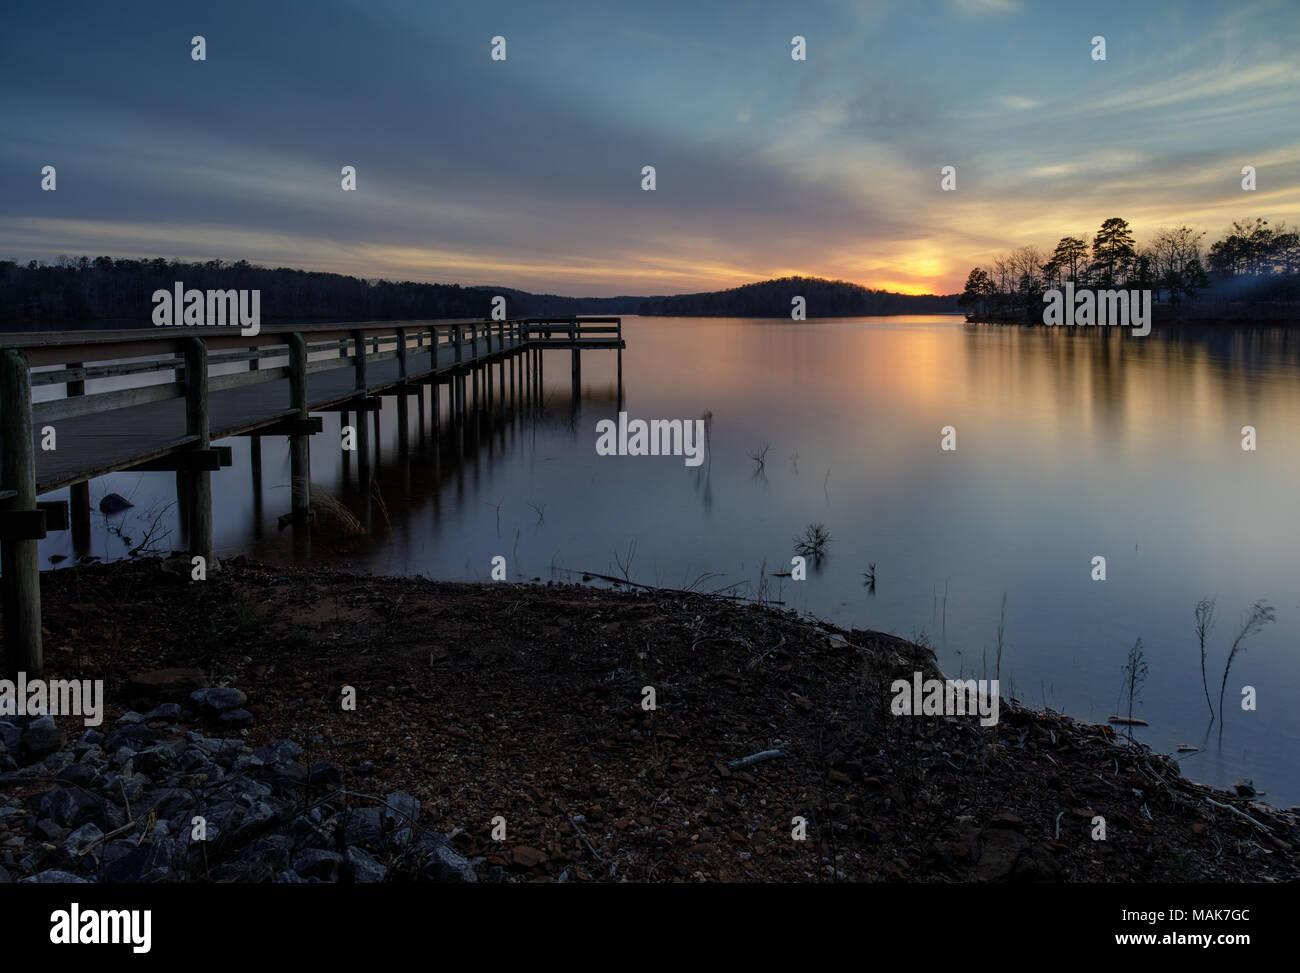 21 Miles Long Stock Photos & 21 Miles Long Stock Images - Alamy